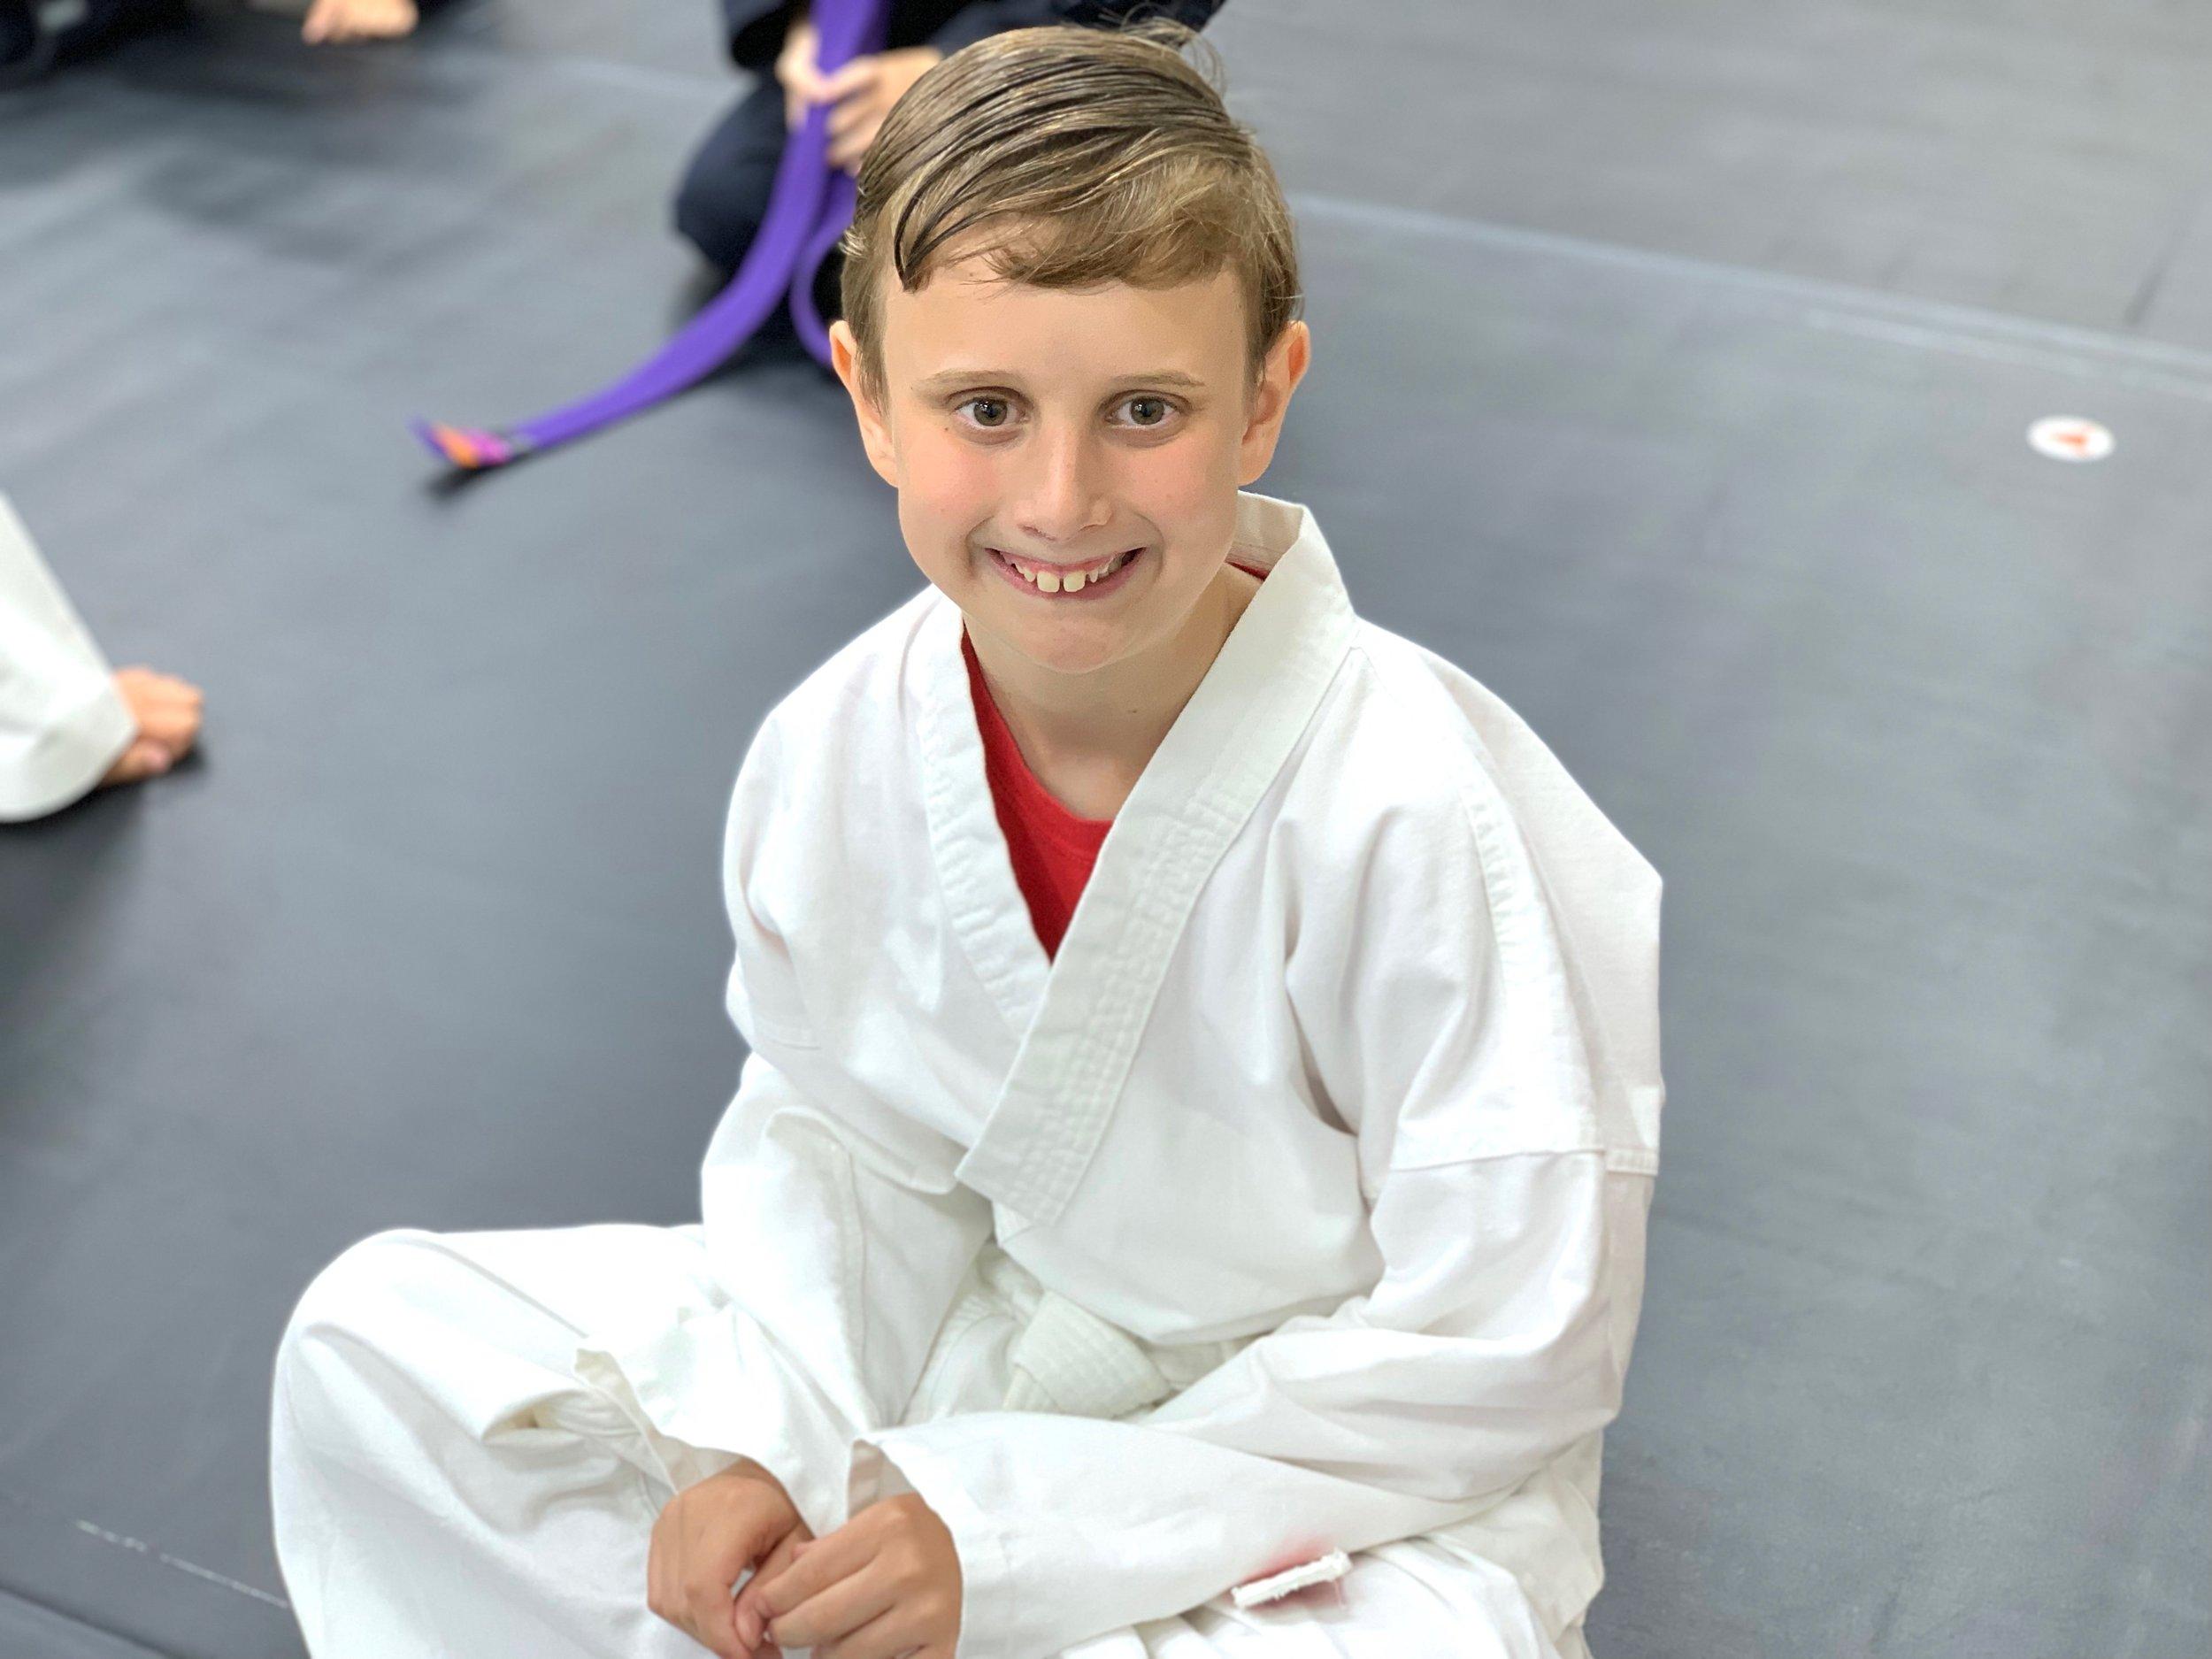 karate-kids-program-souhtlake-keller-grapevine-texas00027.jpeg